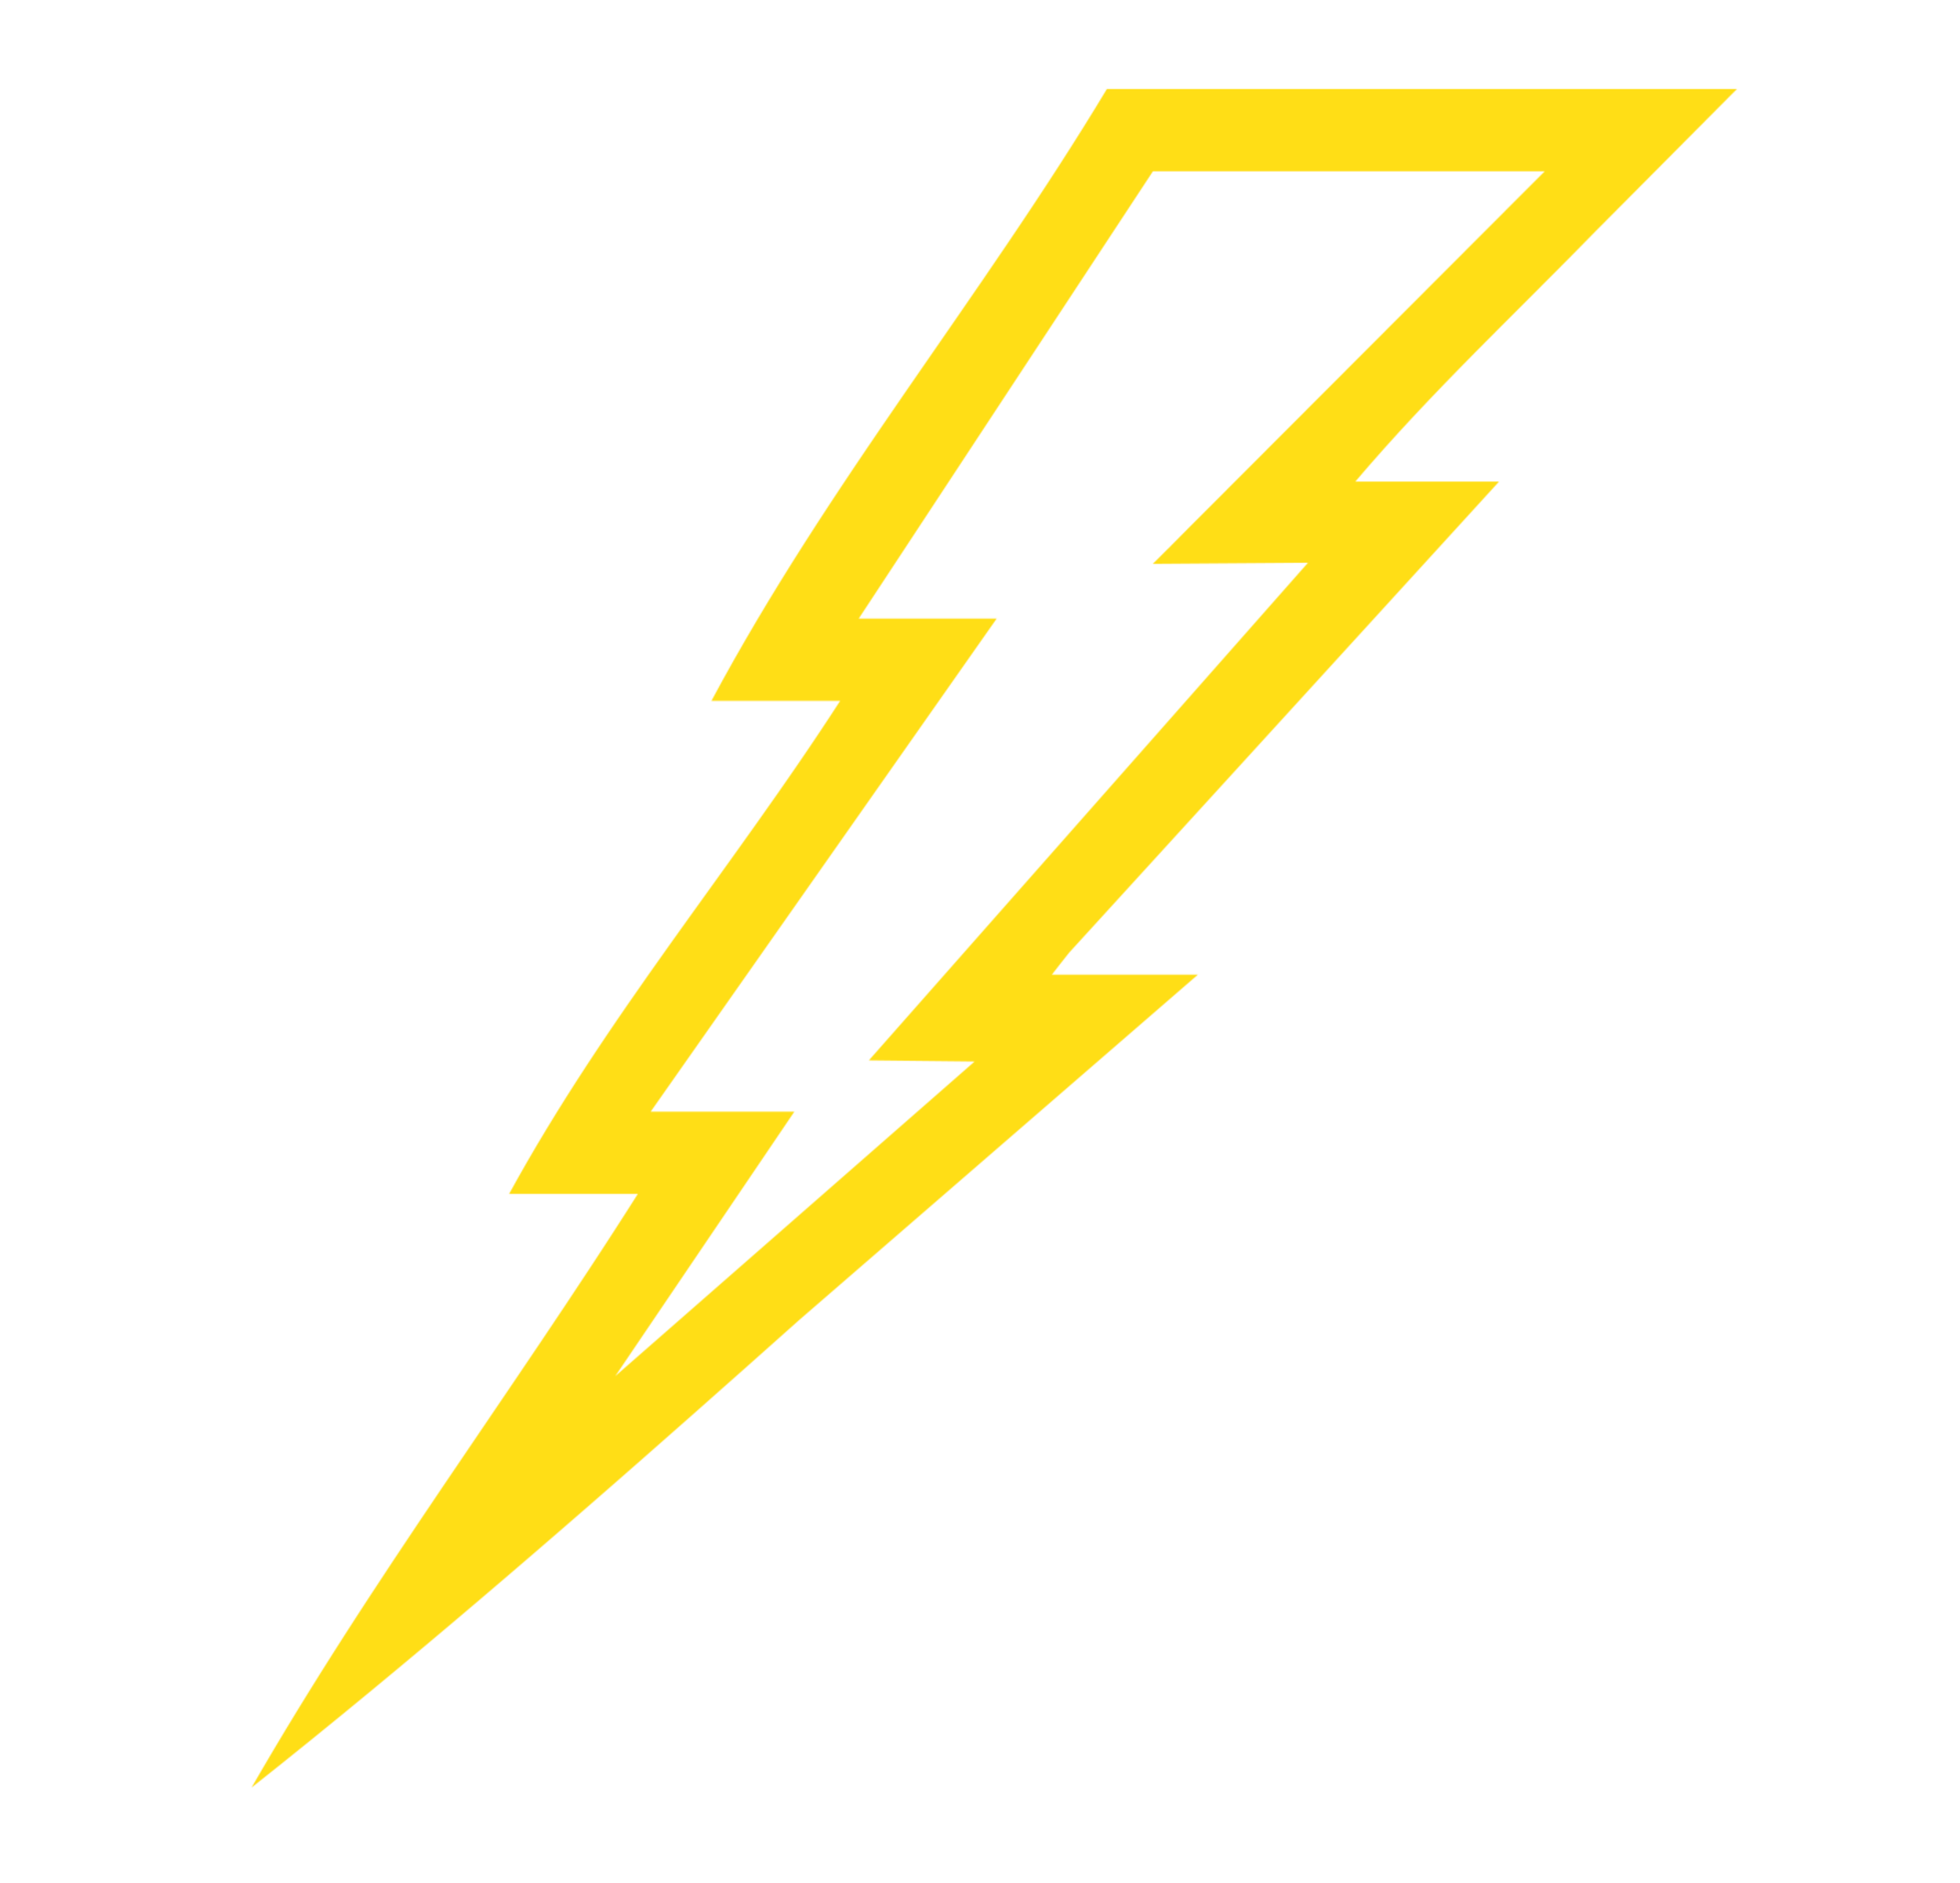 Best Free Lightning Bolt Image Png Transparent Background Free Download 34125 Freeiconspng